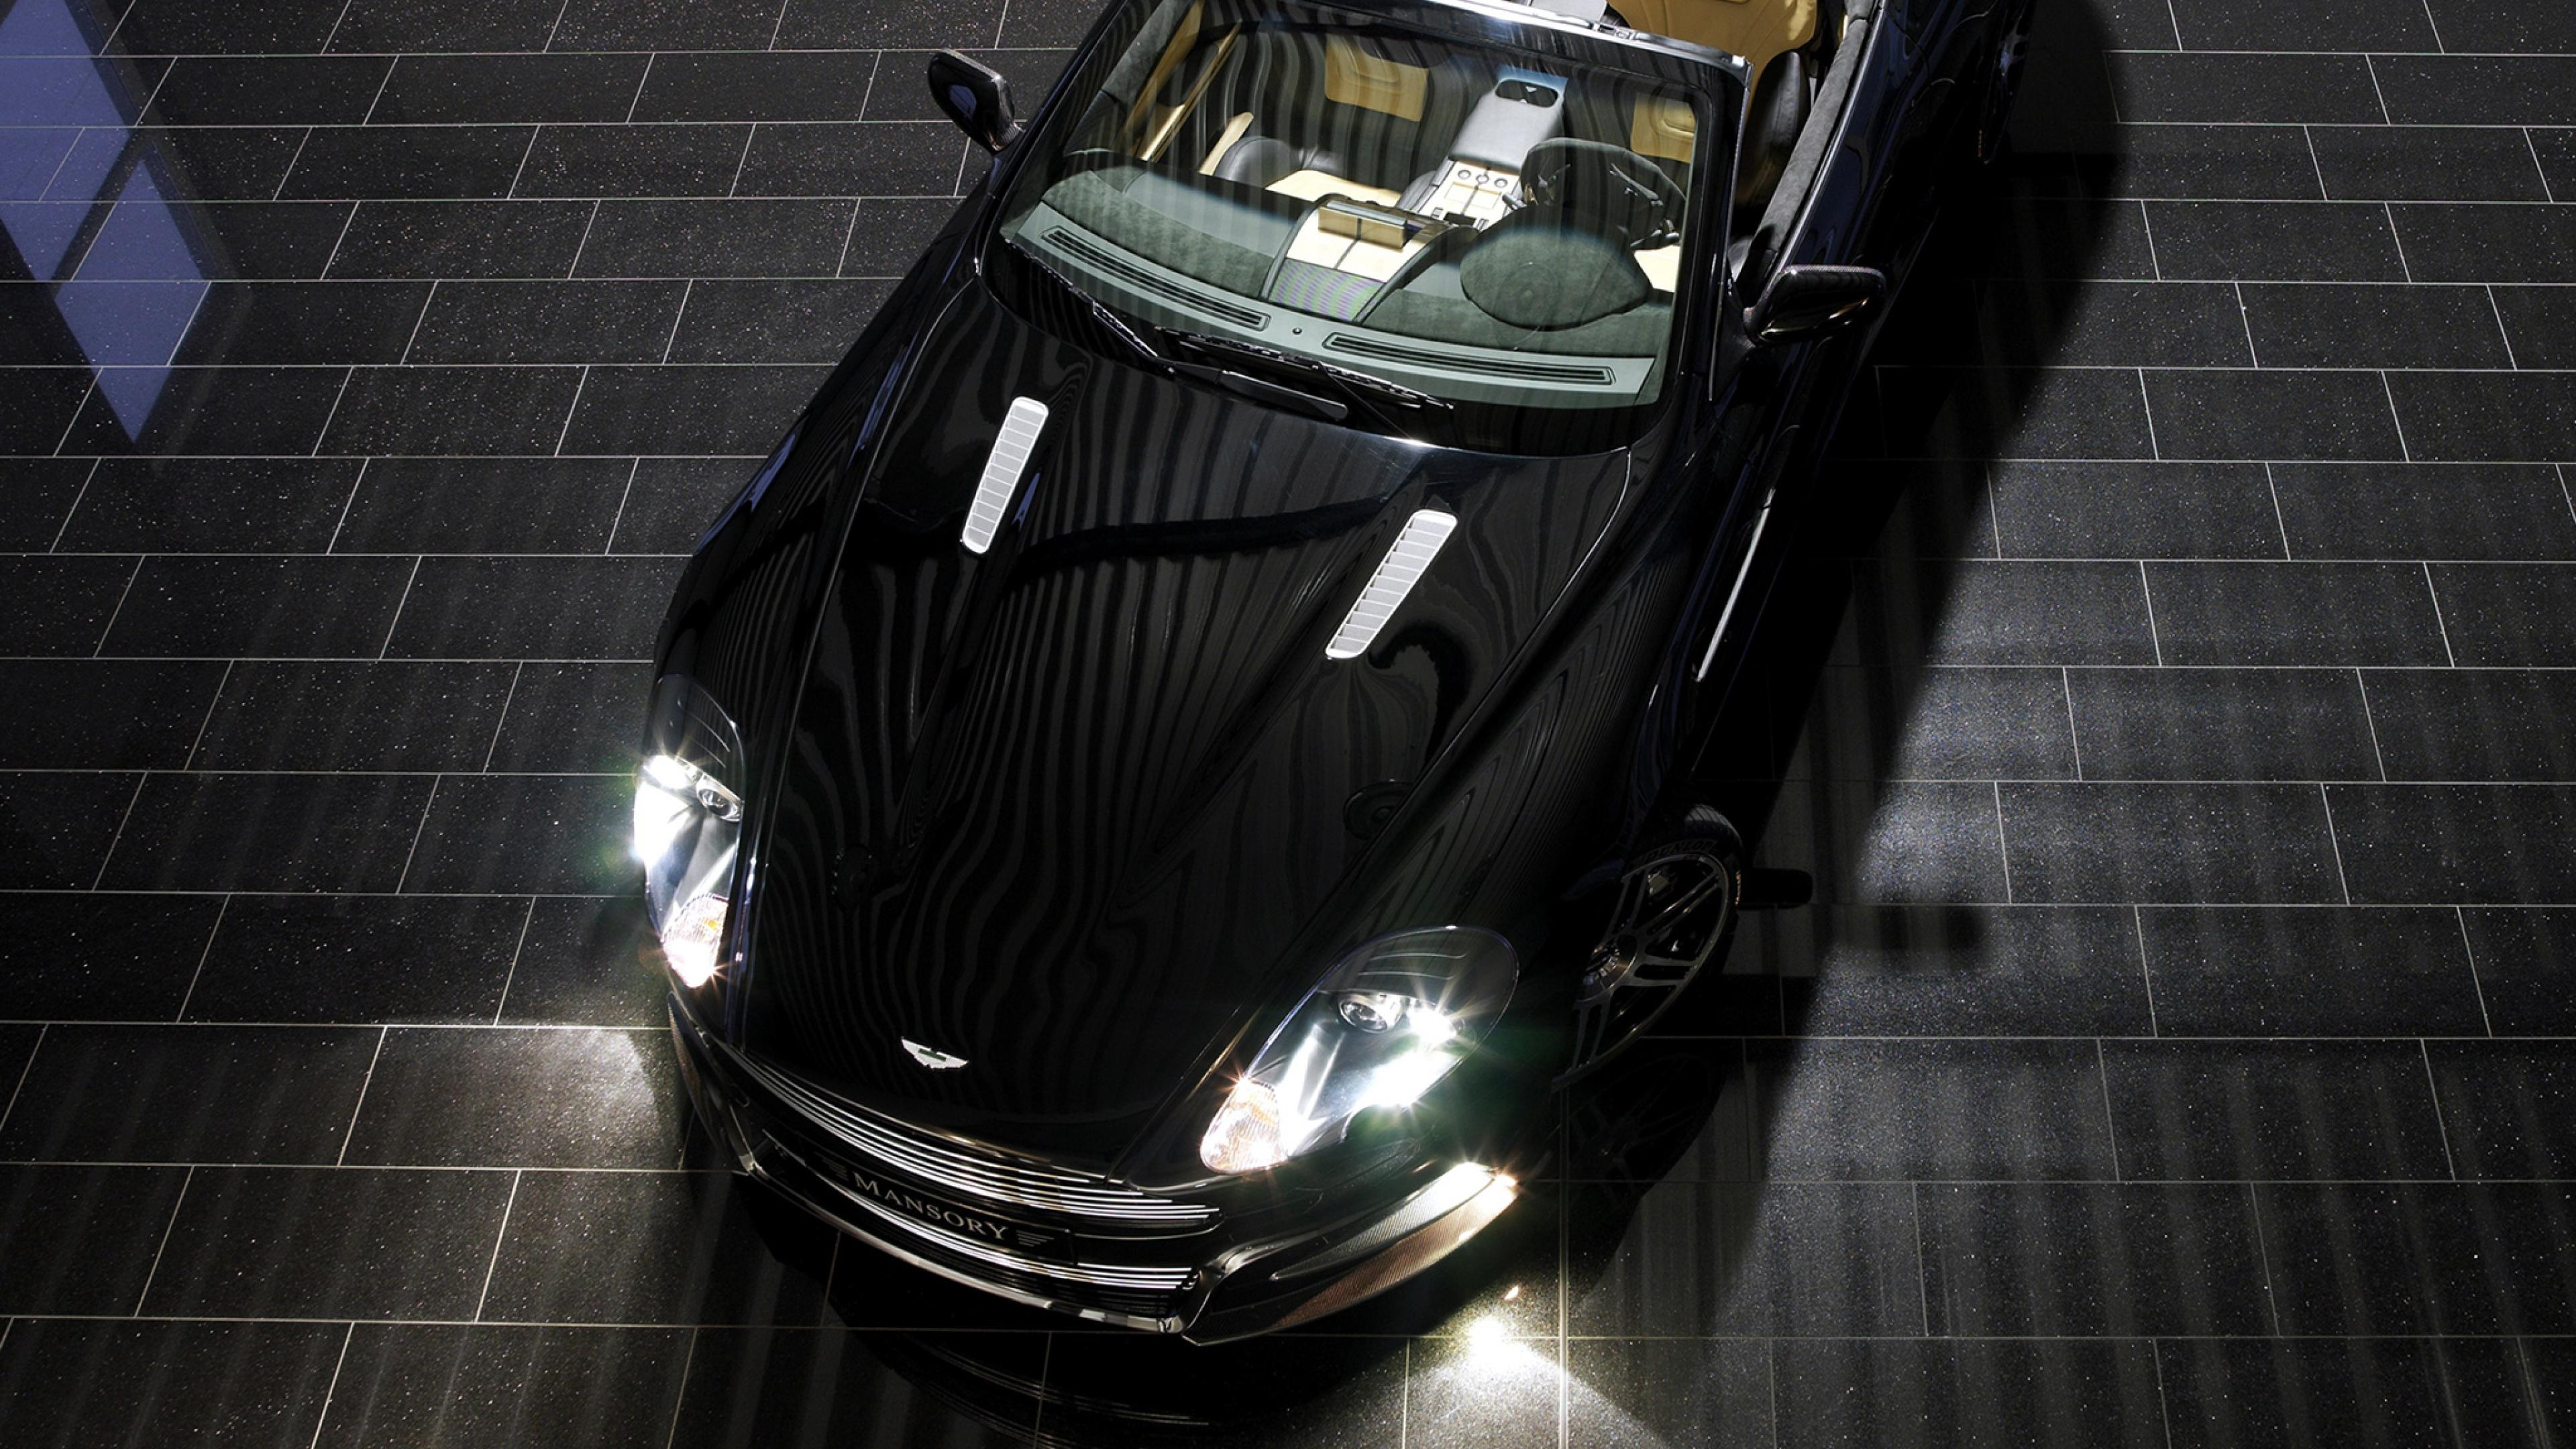 Download Wallpaper 3840x2160 Aston martin Db9 2008 Black Top view 3840x2160